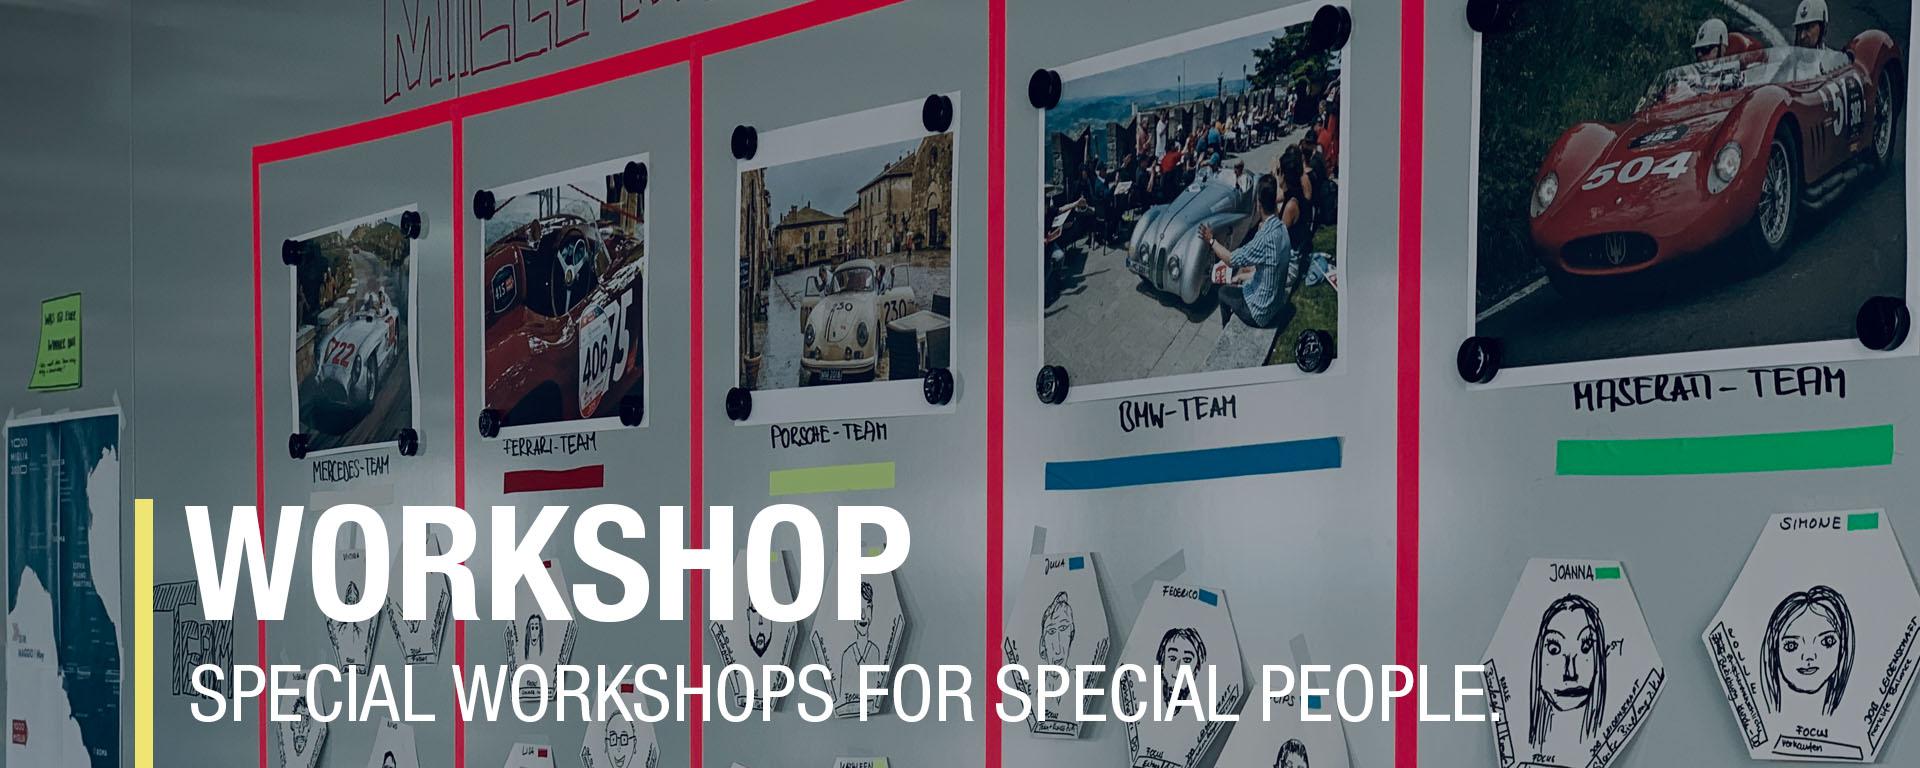 Workshops, Seminars Scrum